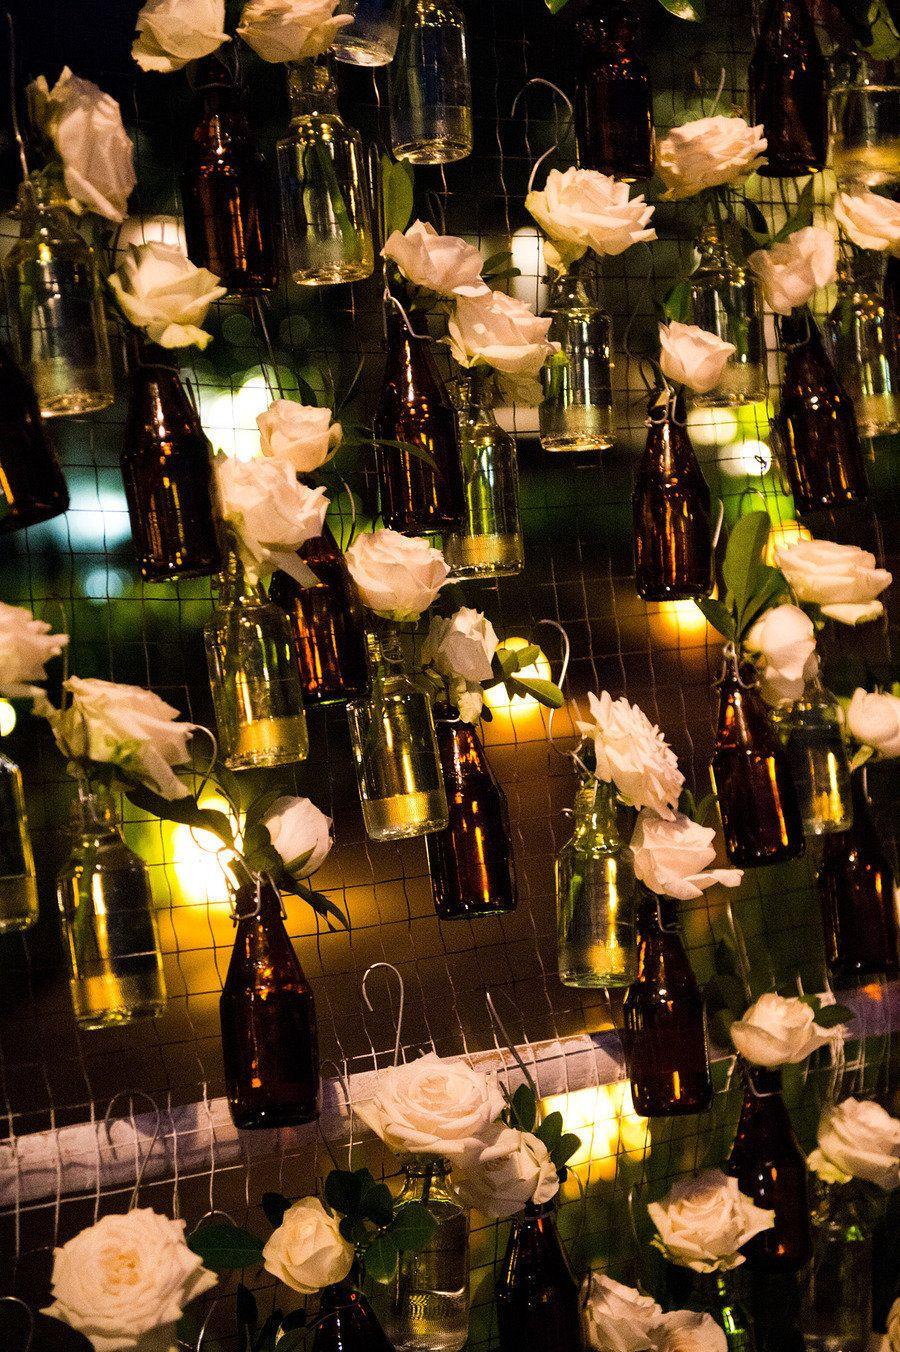 Photography: Studio Impressions Photography   studioimpressions.com.au Floral Design: Bloomz Bali   bloomzflowersbali.com/ Event Planning: M & M Innovative Concepts   mnm-concepts.com/   View more: http://stylemepretty.com/vault/gallery/12262